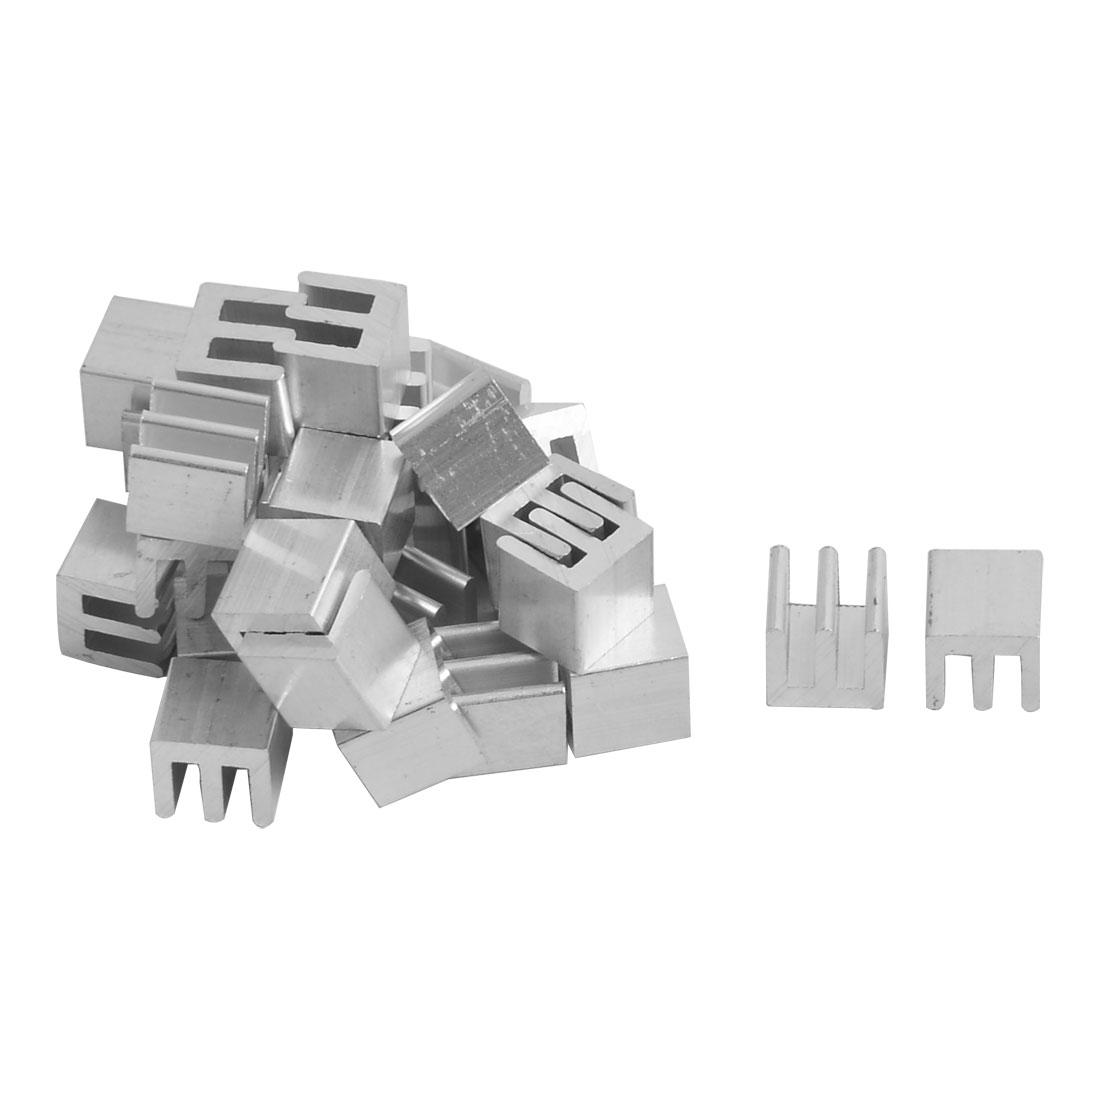 Aluminium Heatsink Cooling Fin Cooler Silver Tone 8mm x 8mm x 8.5mm 30 Pcs